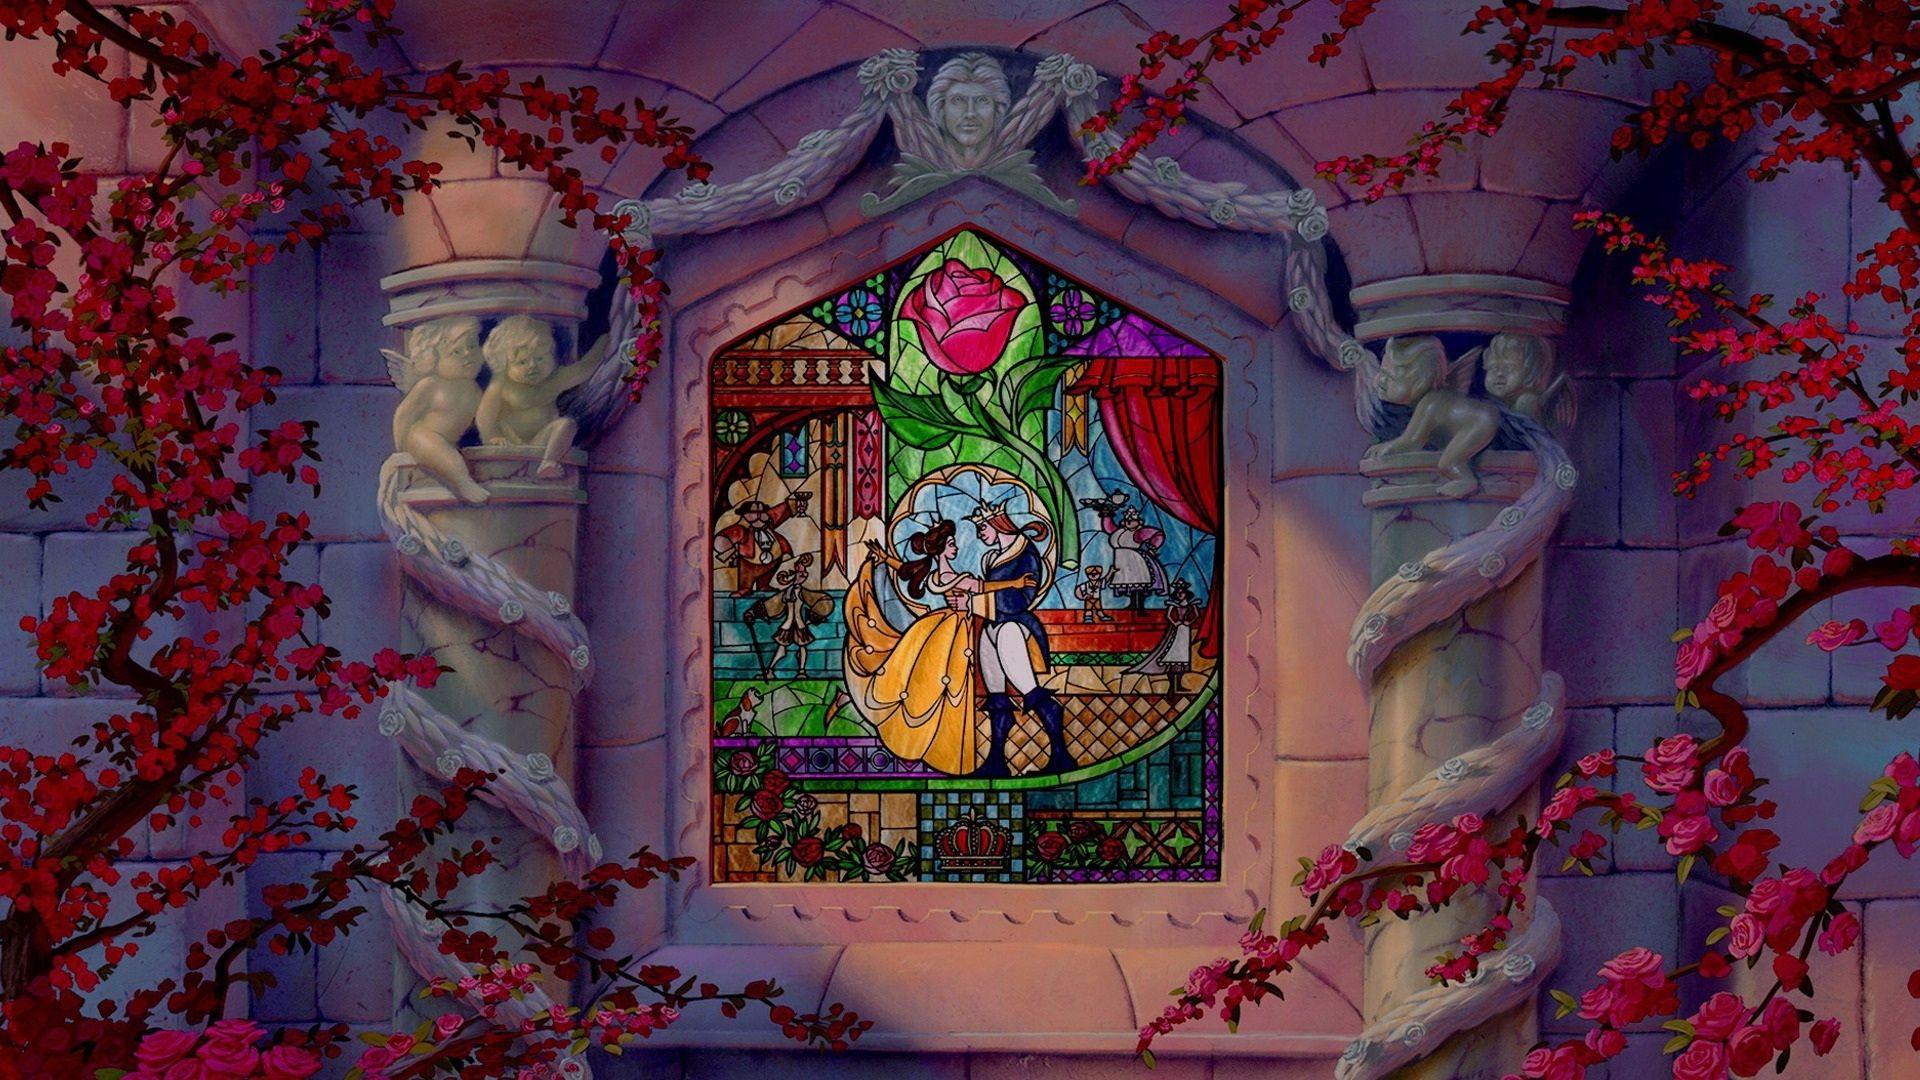 Download Wallpaper Macbook Disney - 68e80c37dae10f5706791ada2d4952e3  Best Photo Reference_40774.jpg